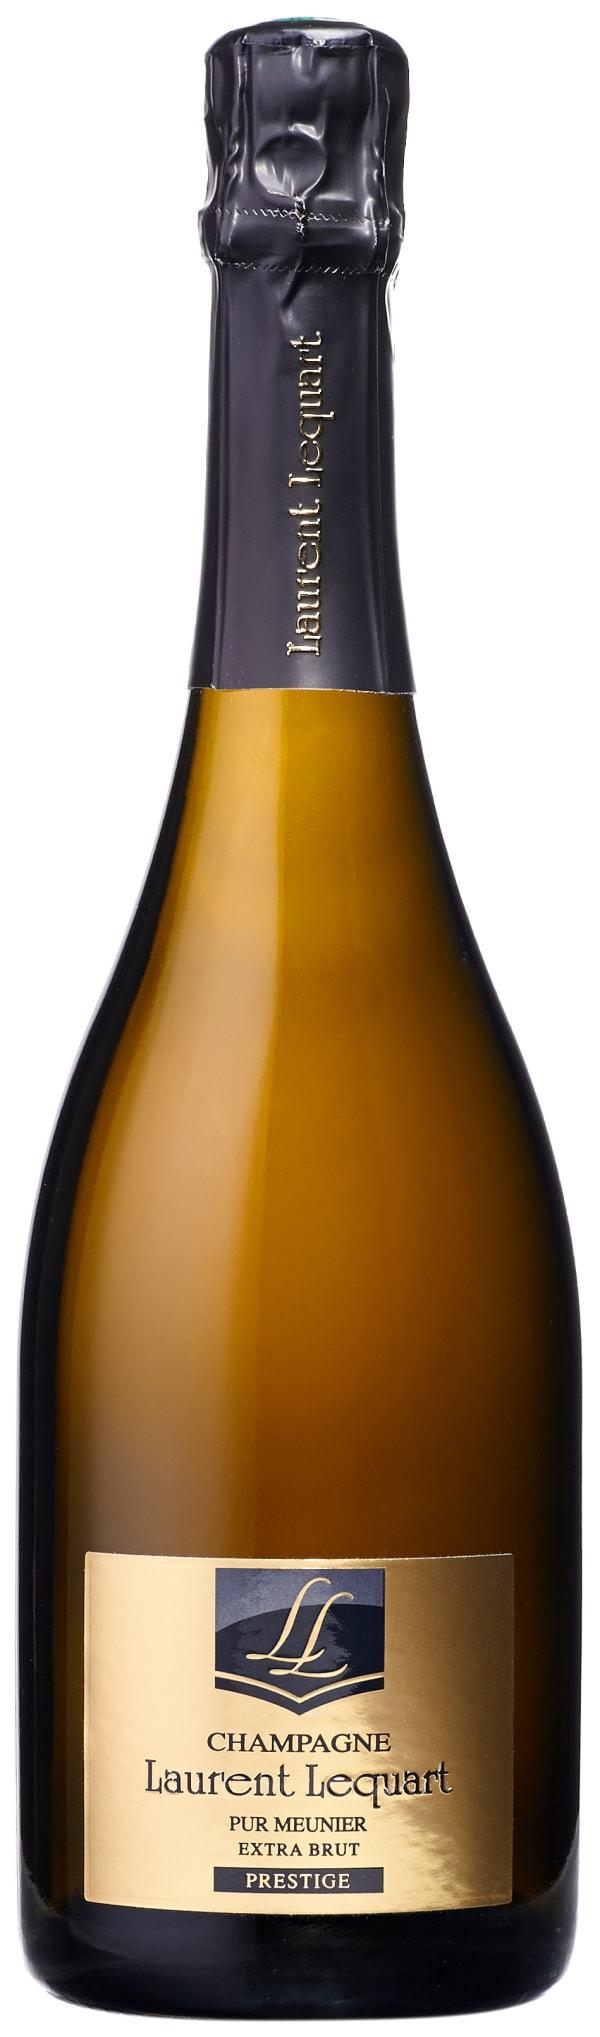 Laurent Lequart Pur Meunier Prestige Champagne Extra Brut